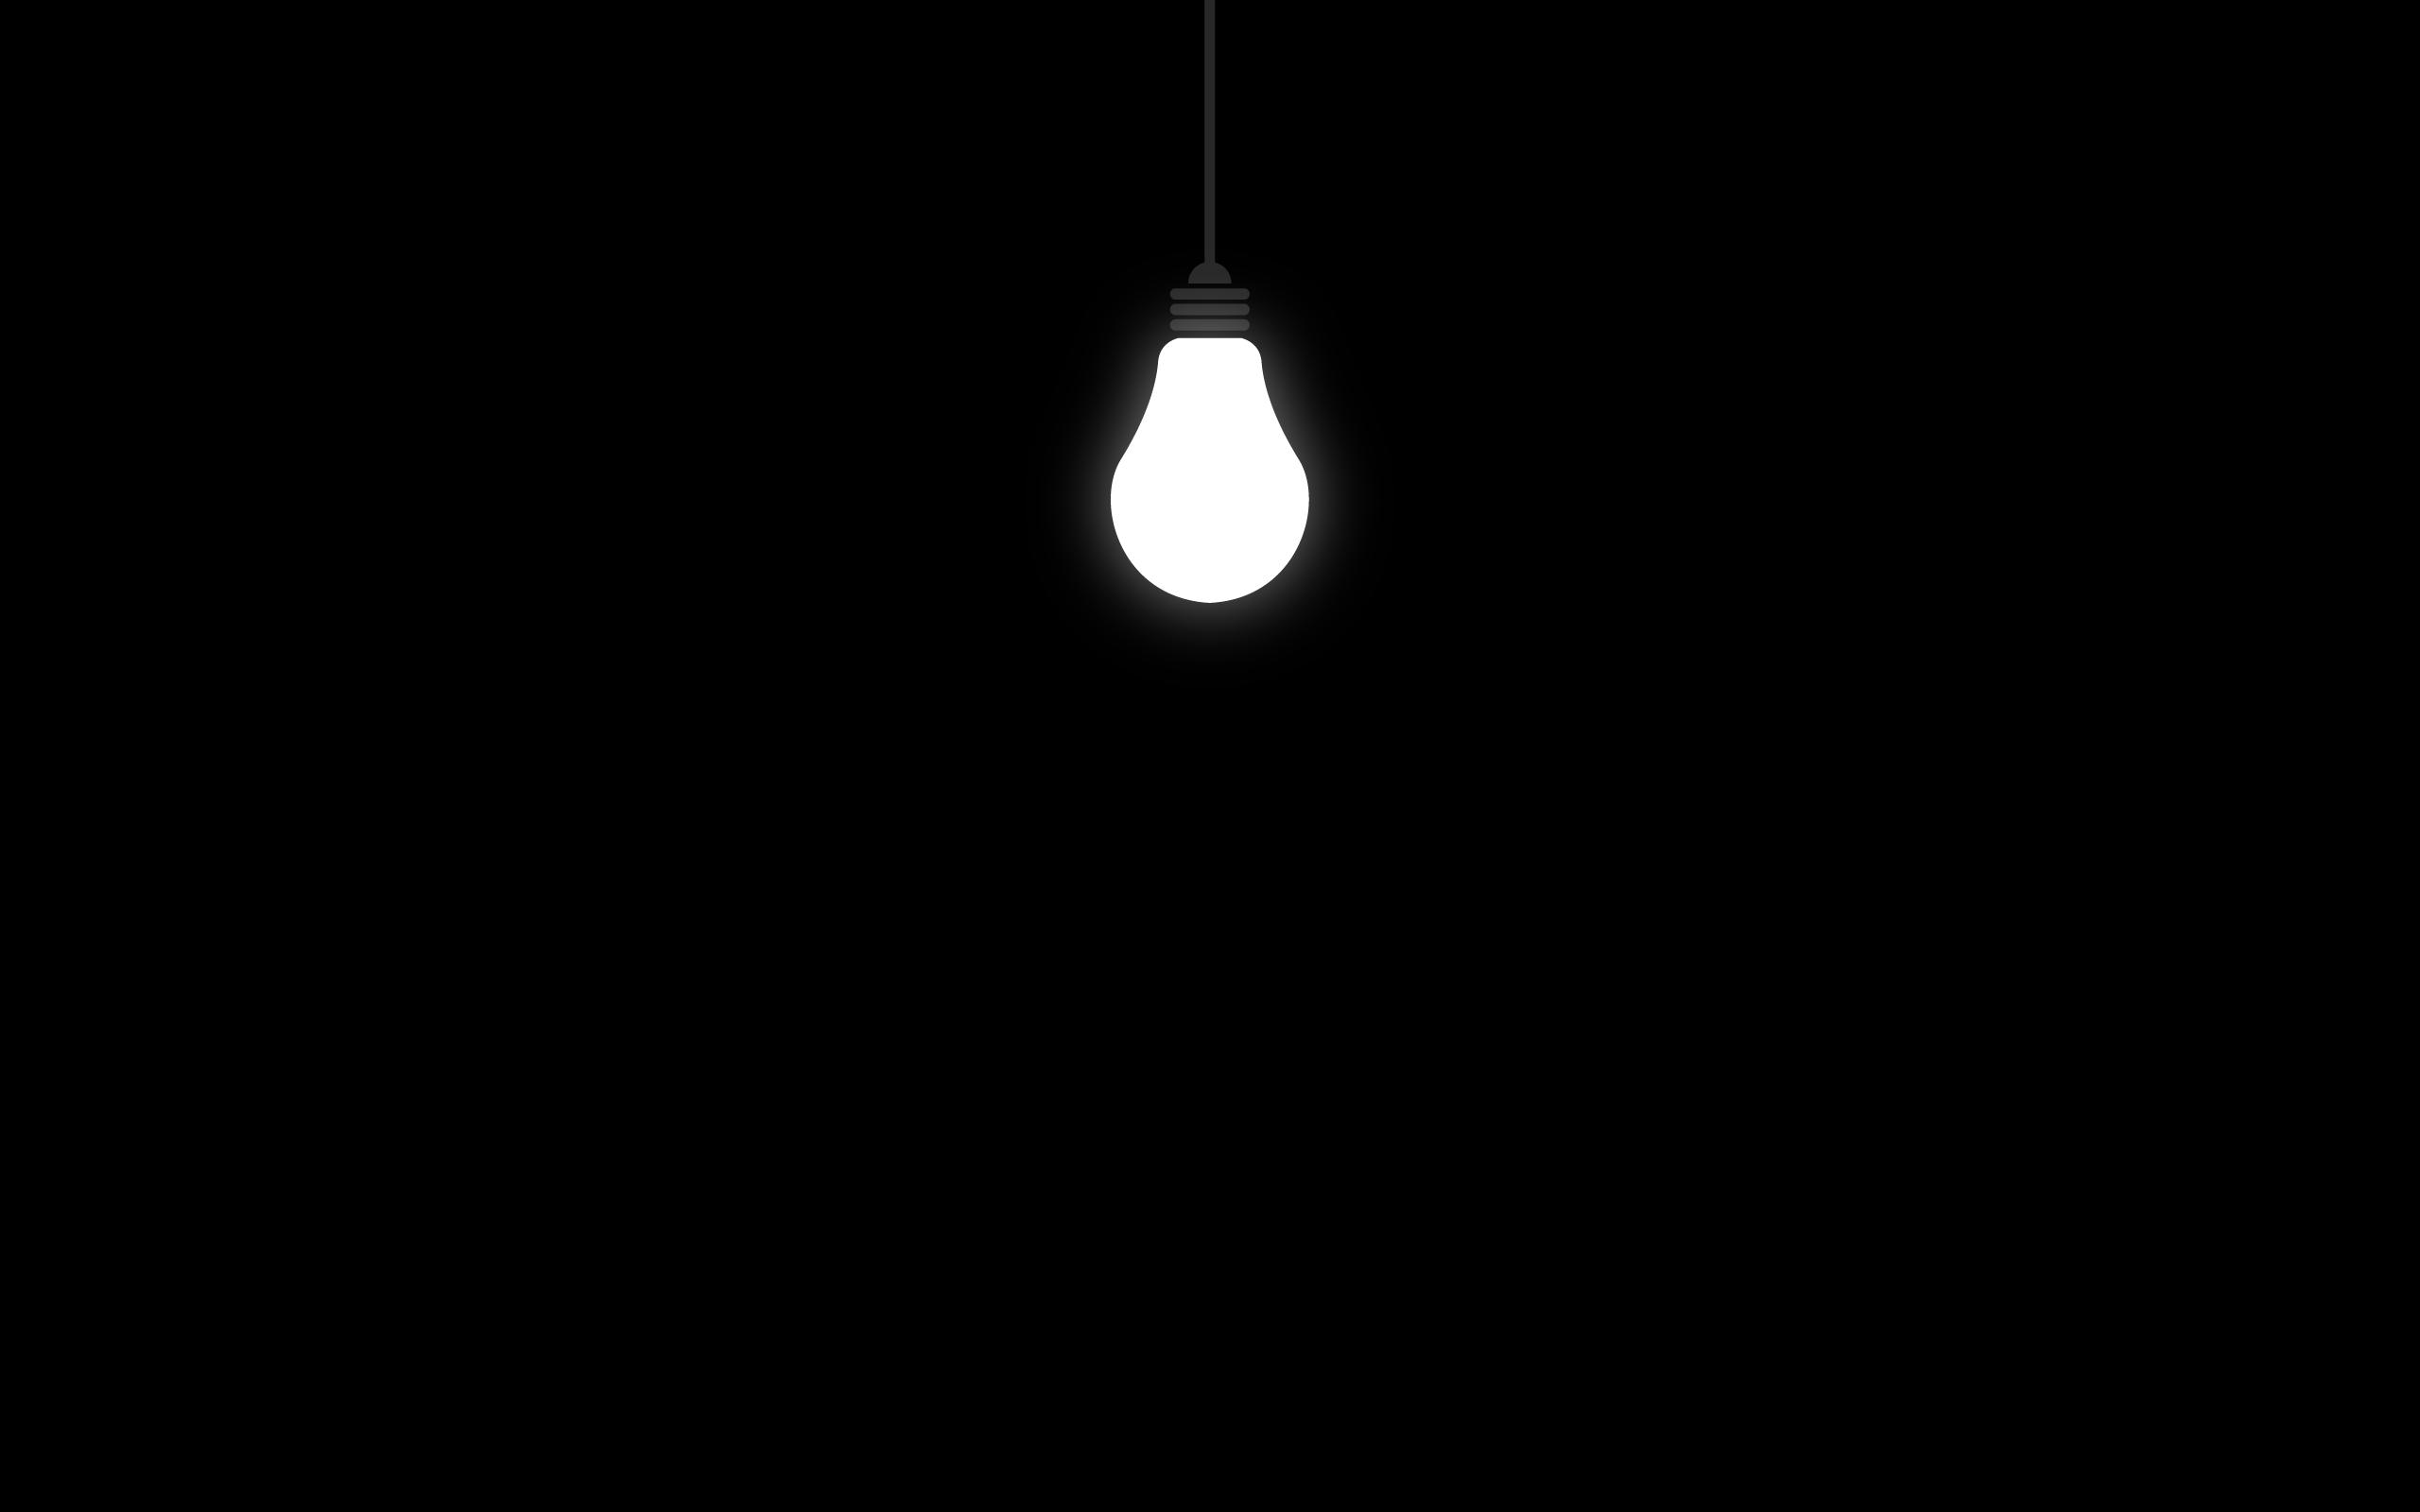 Black light bulbs black background ...